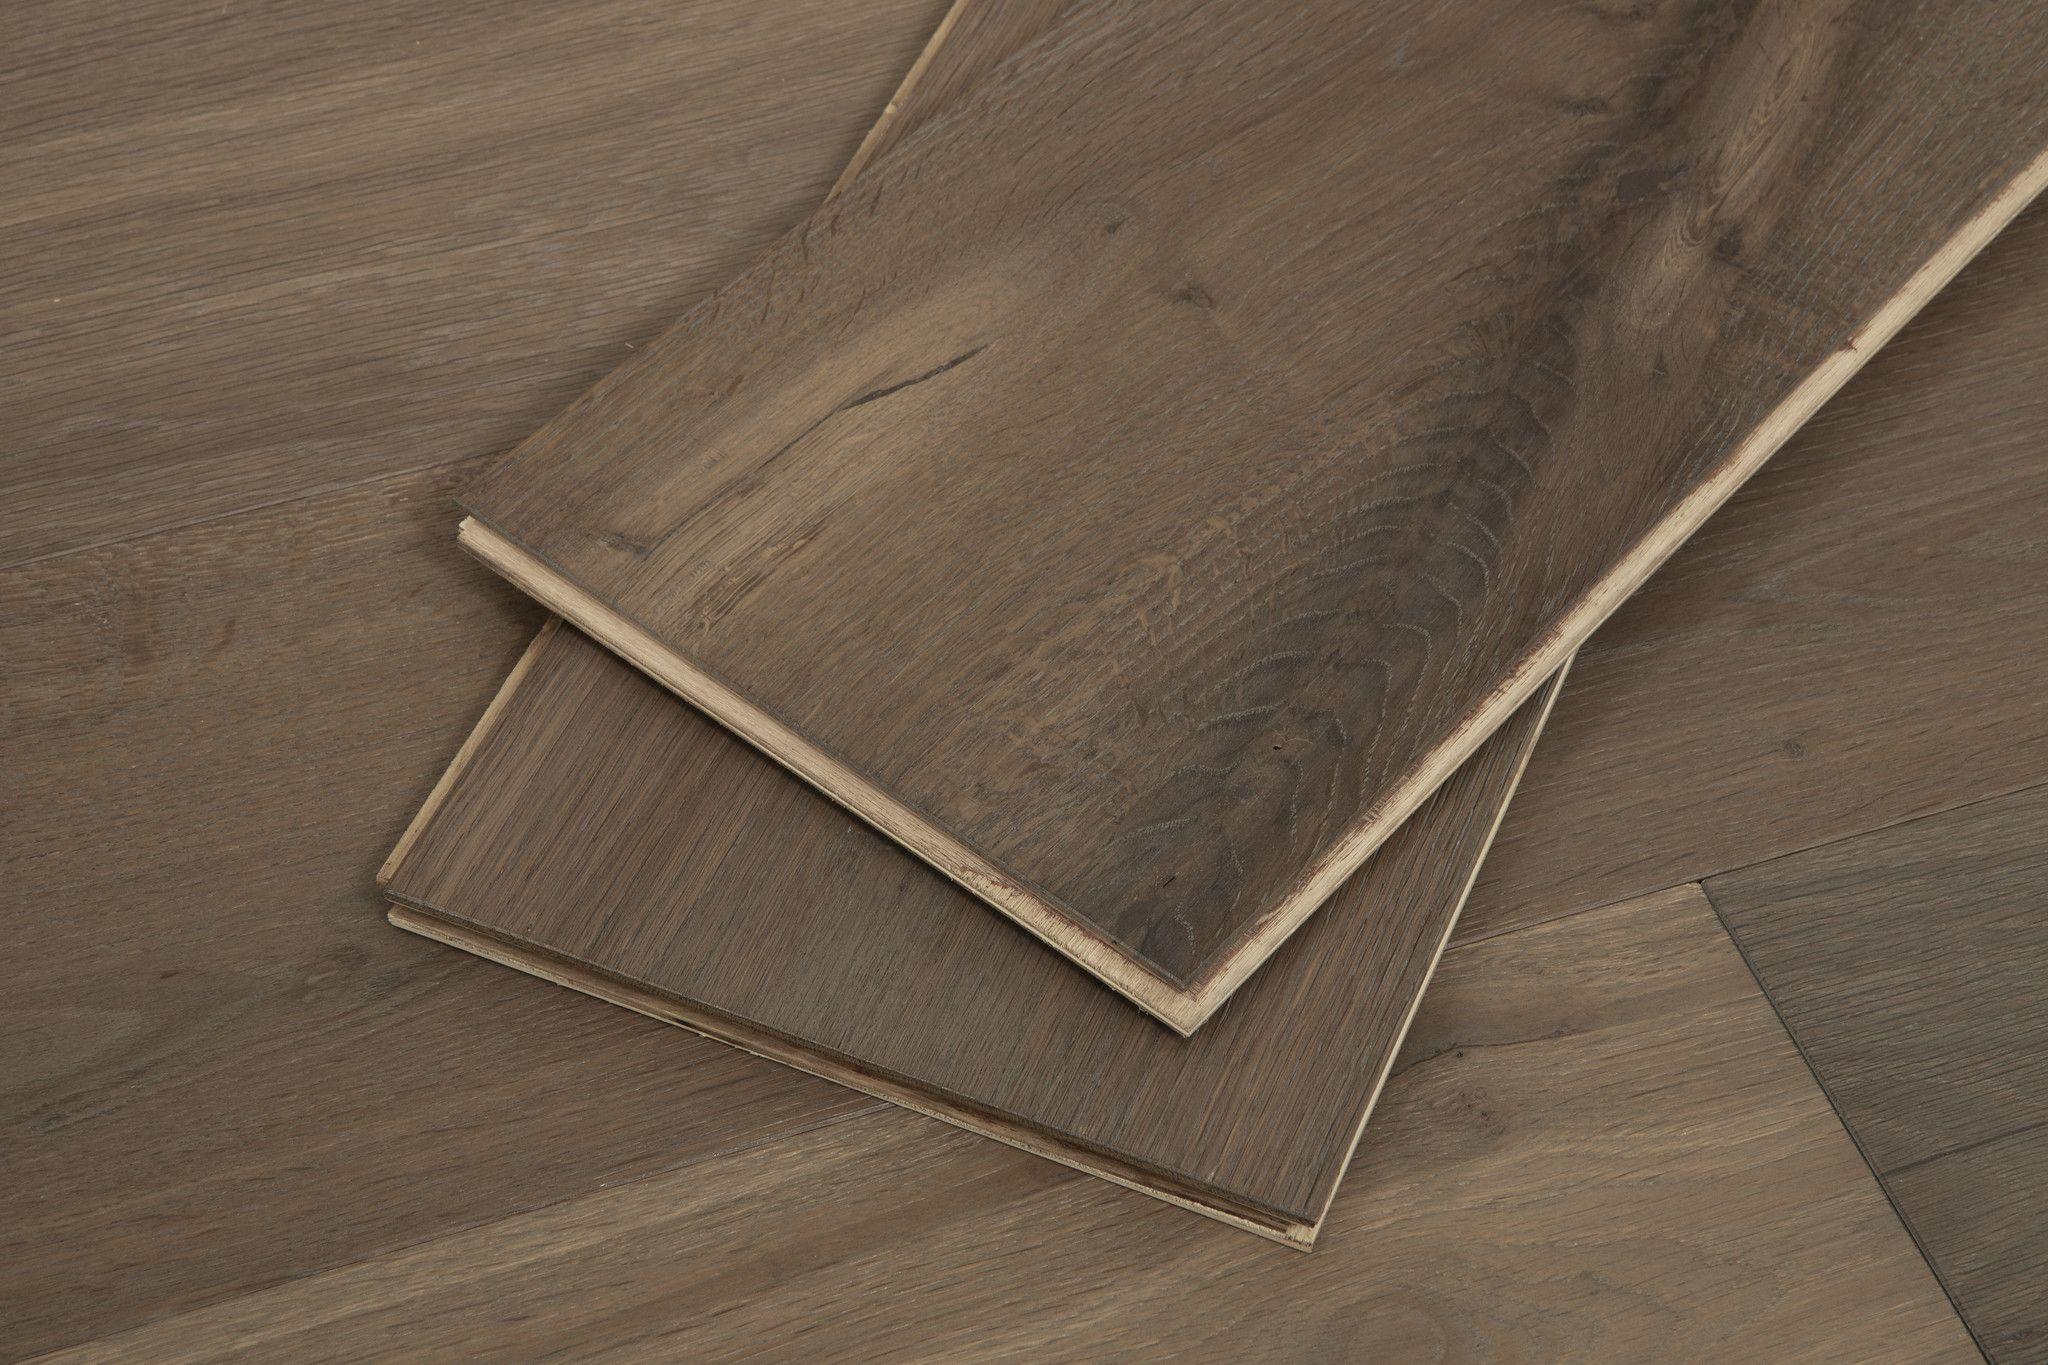 Vineyard Oak Extra Wide T G Cali Hardwoods Flooring Oak Engineered Hardwood Engineered Hardwood Engineered Oak Flooring